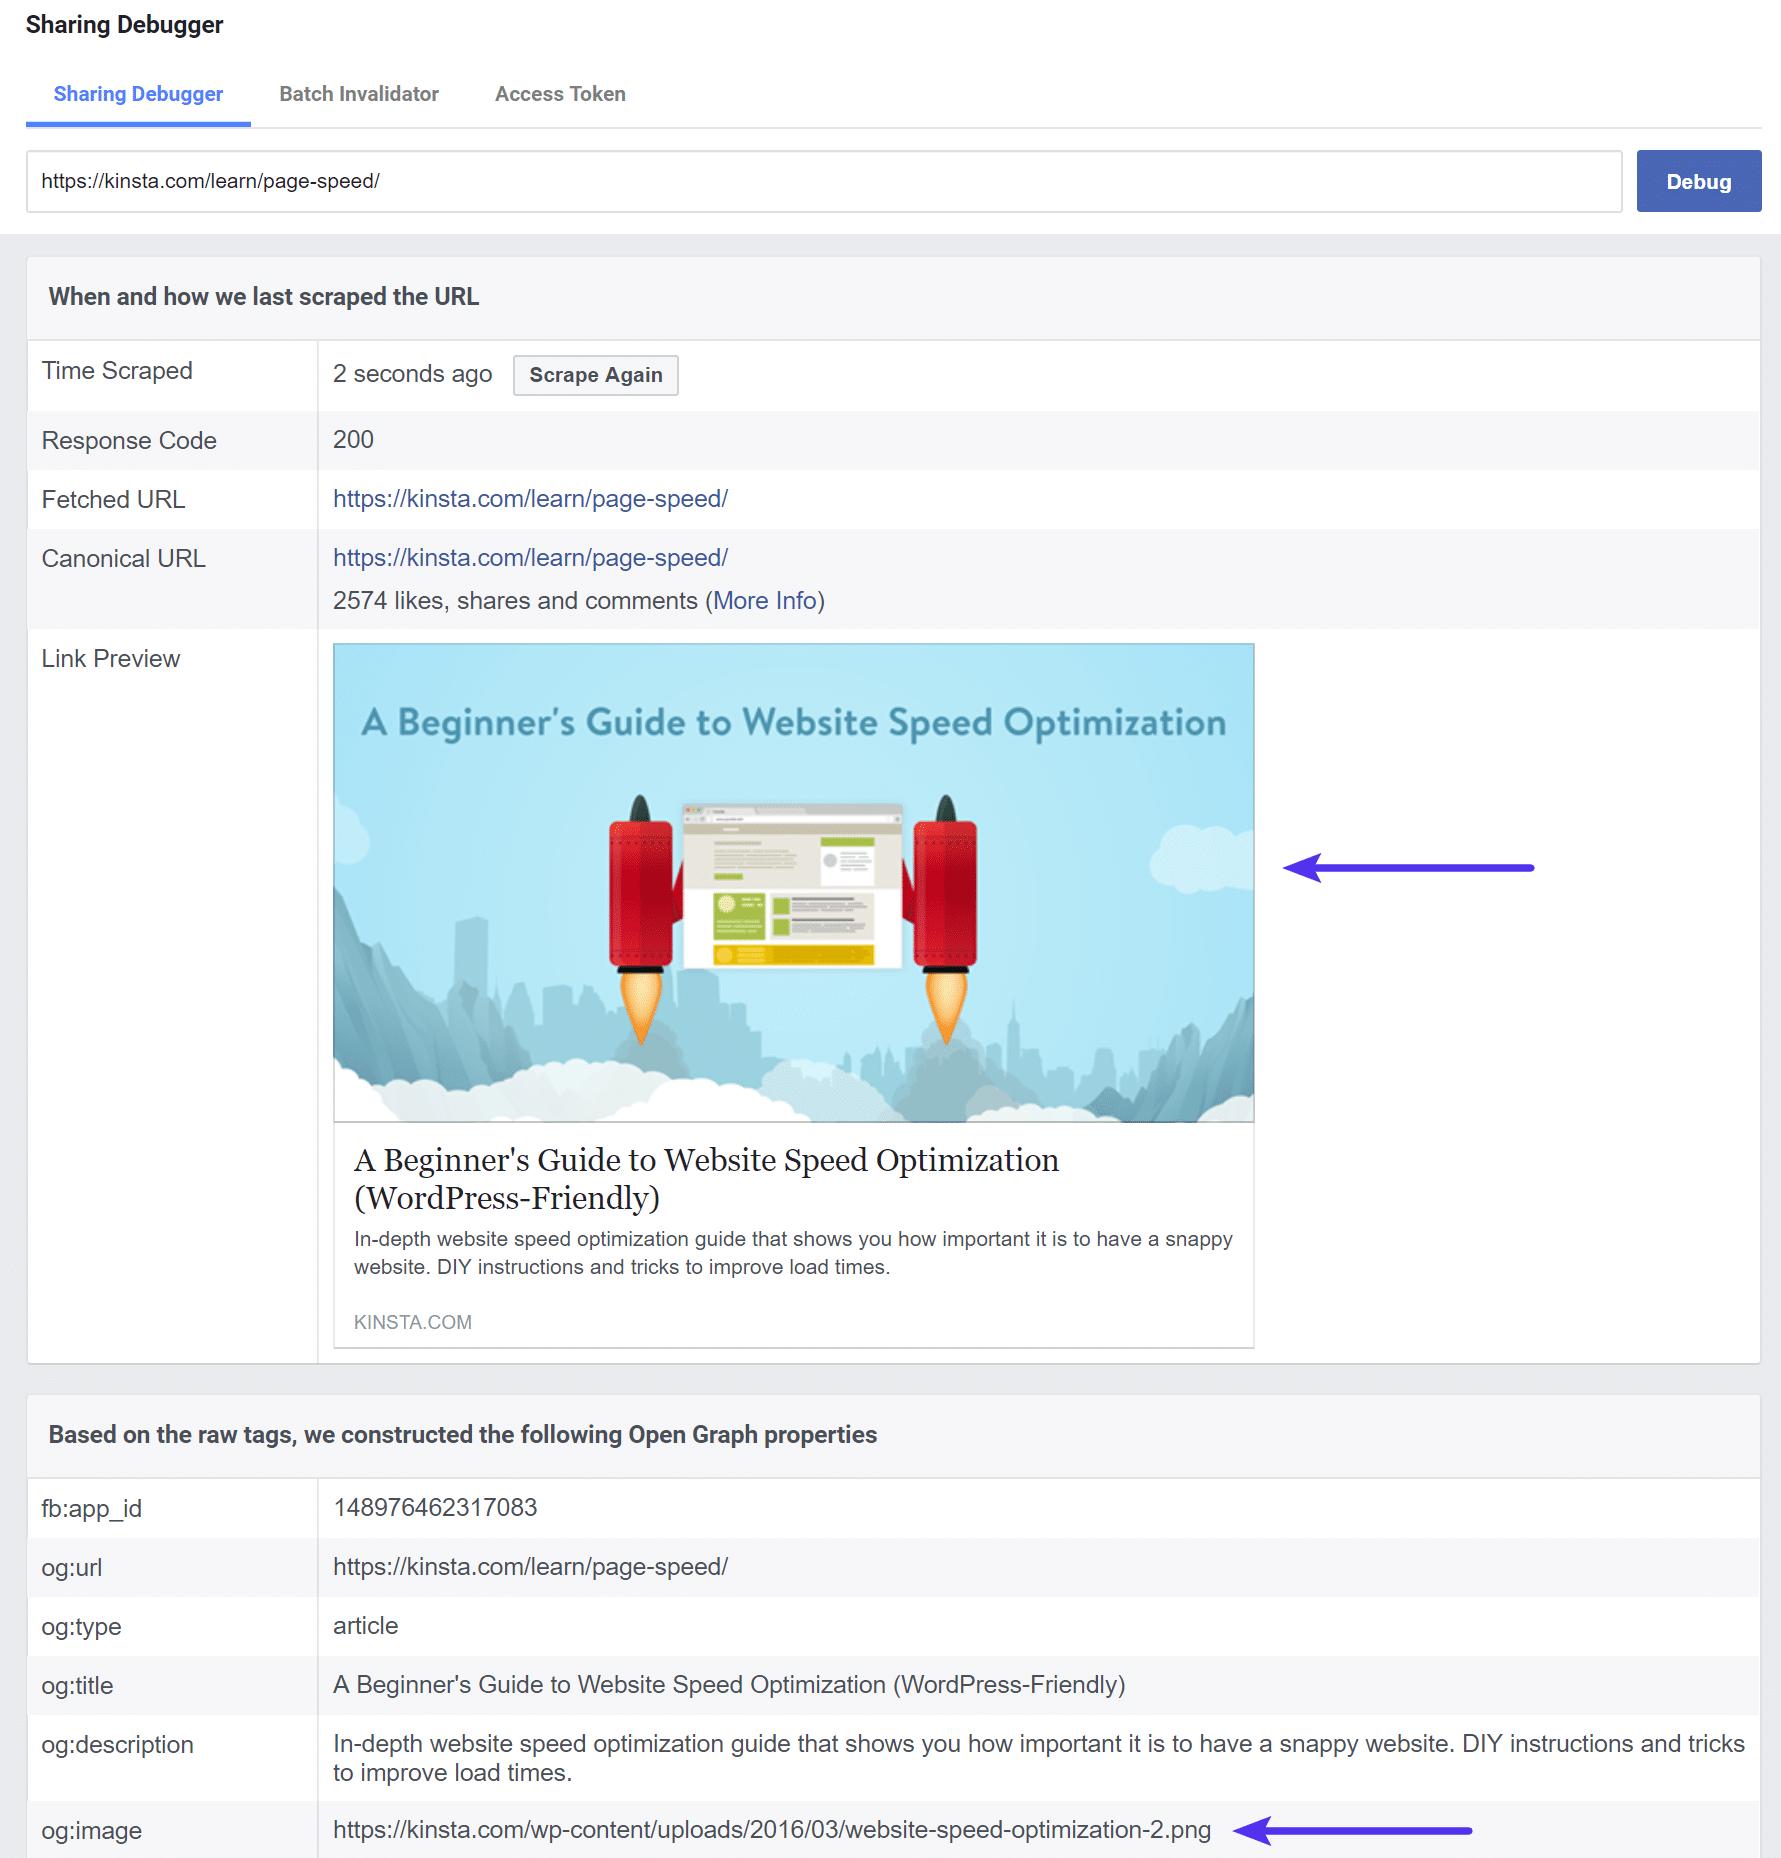 Facebook Debuggerツールでの新しい画像の表示